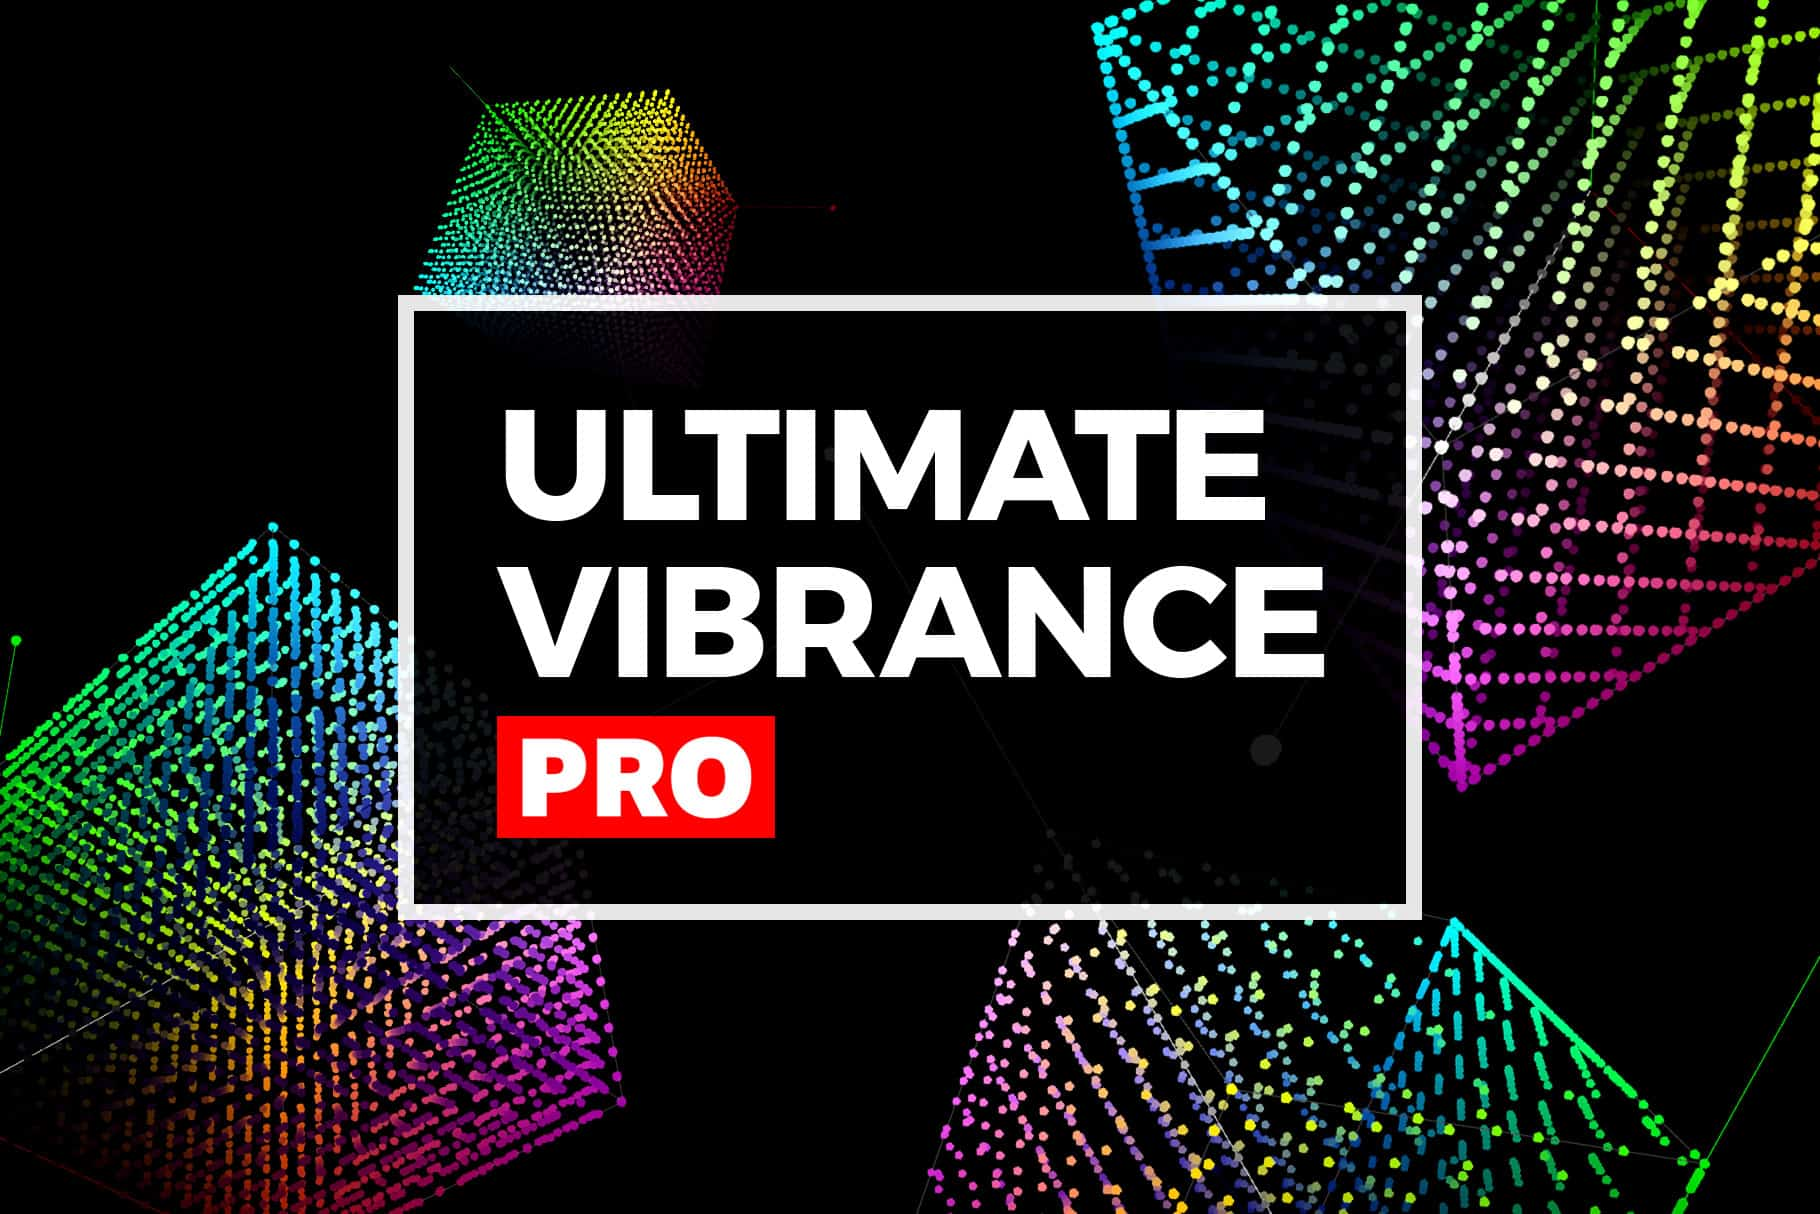 Ultimate Vibrance Lets You Test 4 Alternatives to Vibrance